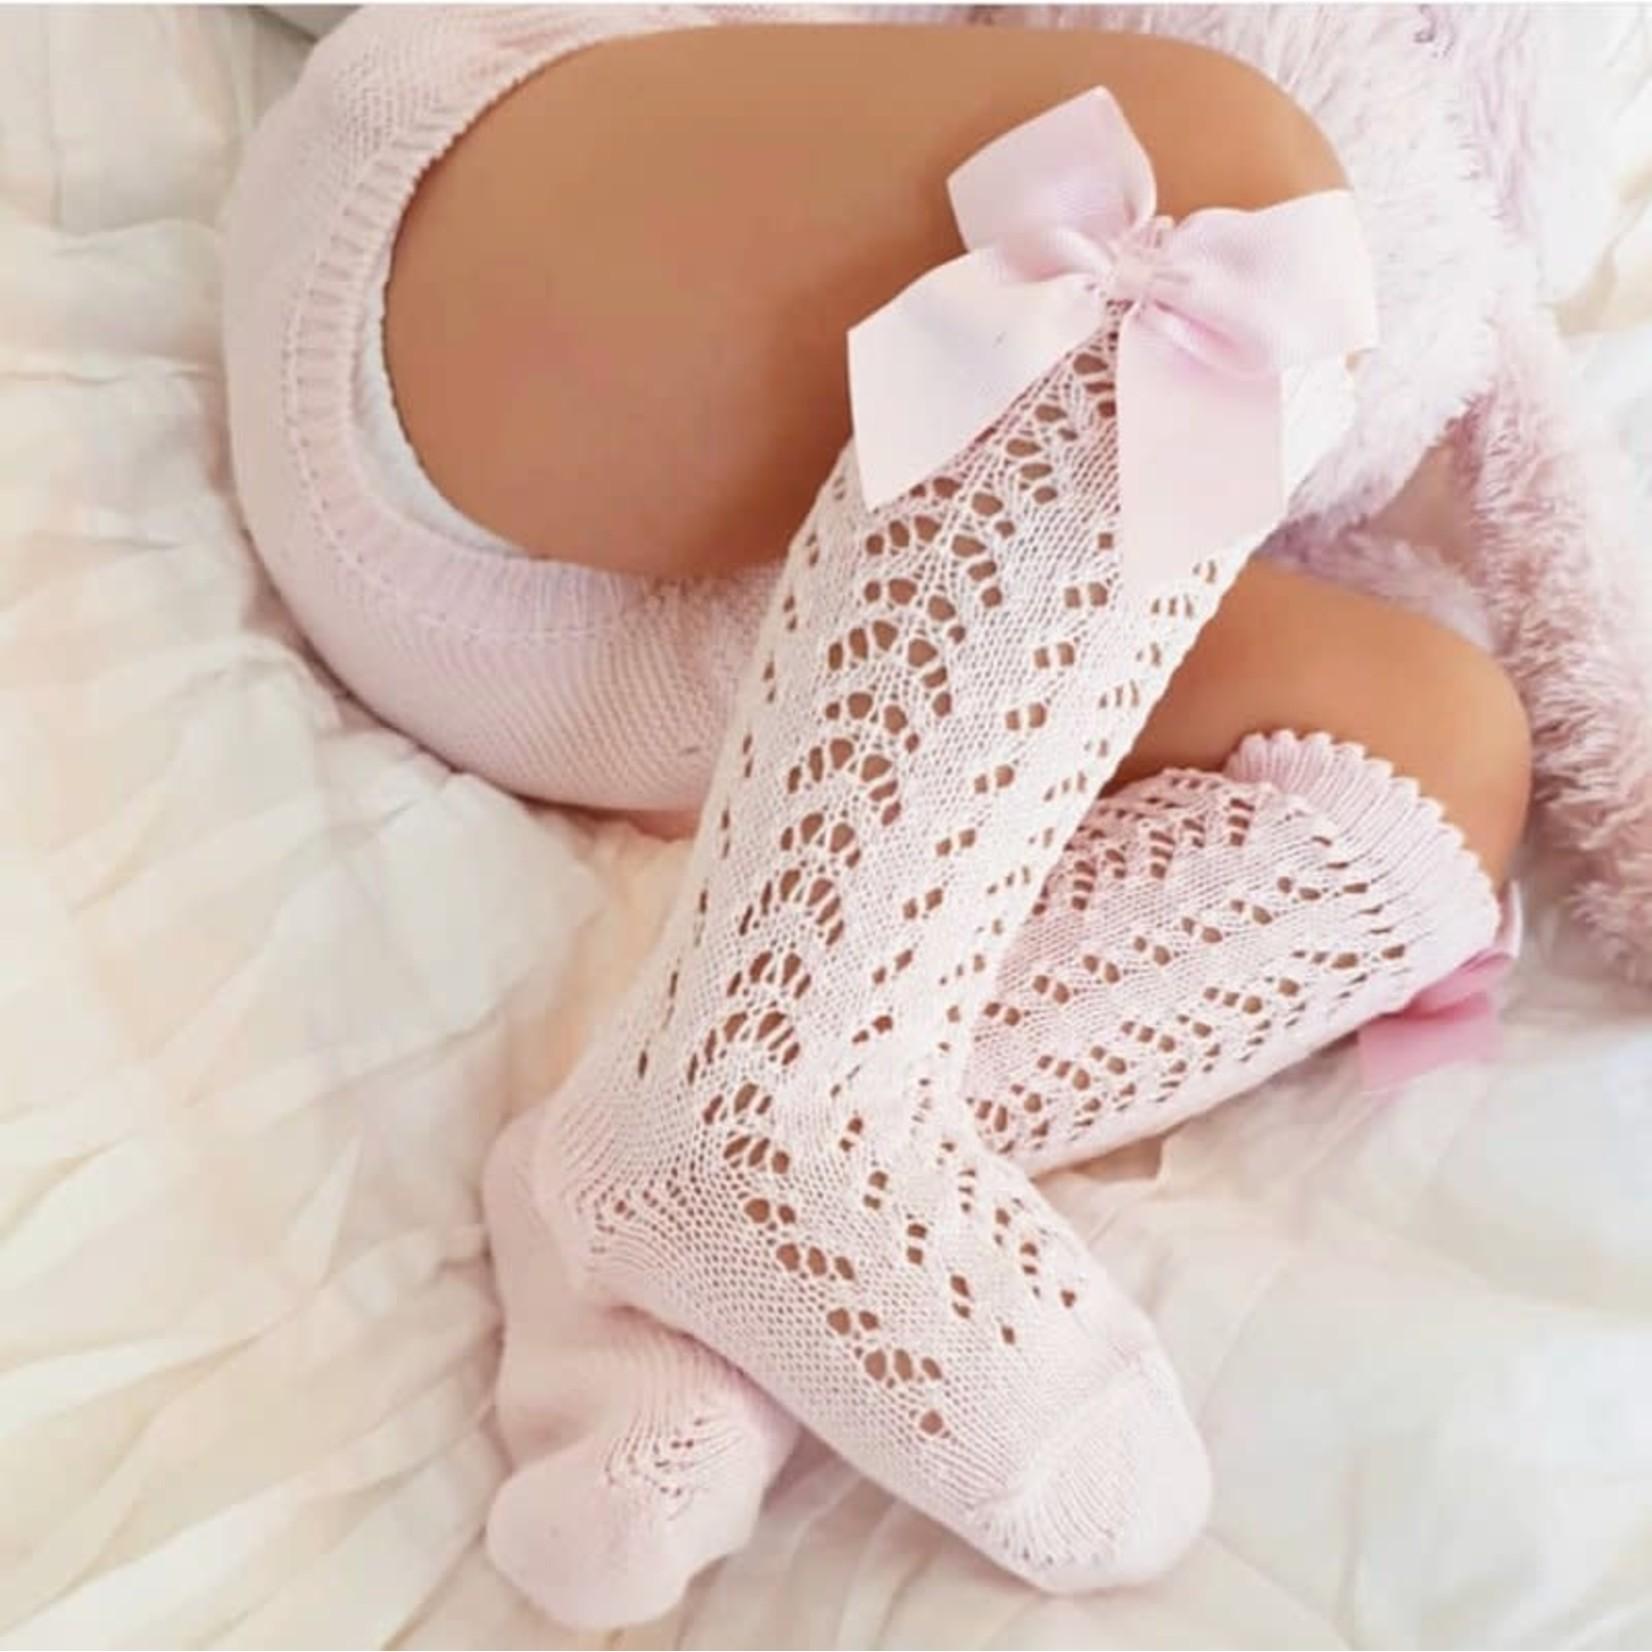 Condor Socks Open w/Bow - Pink